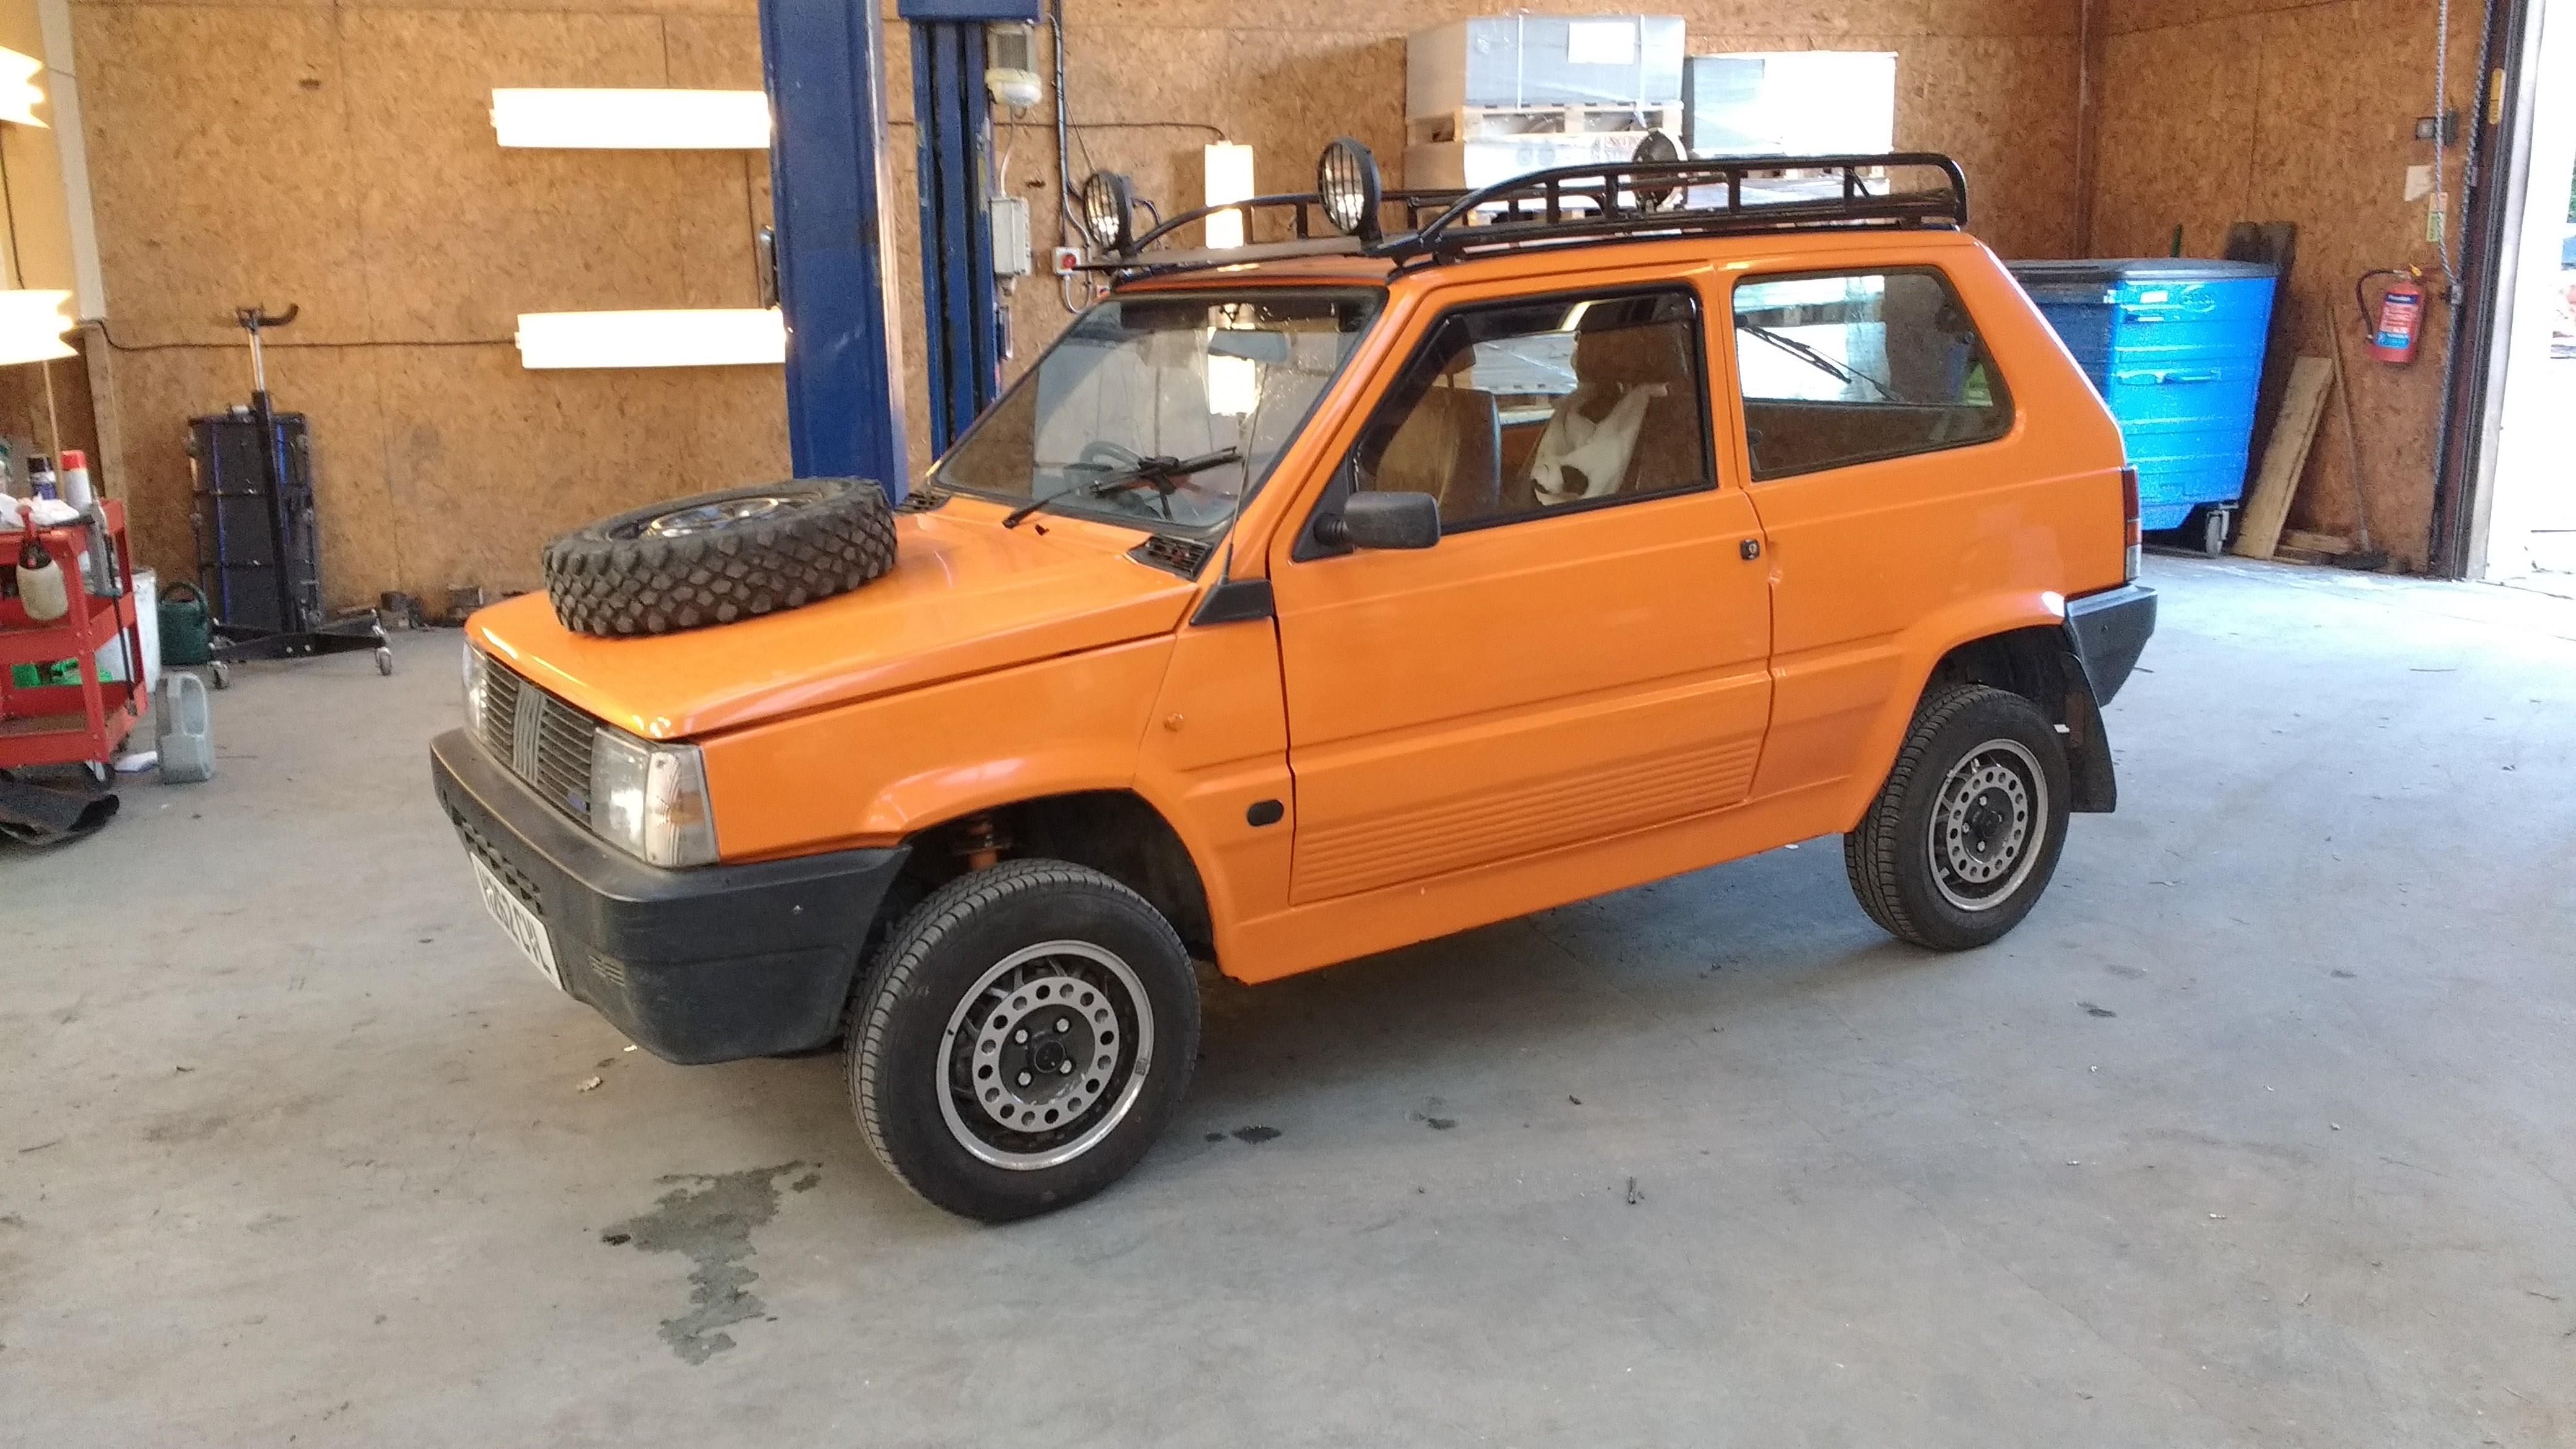 Fiat Panda 4x4 Steering Problems ✓ The FIAT Car